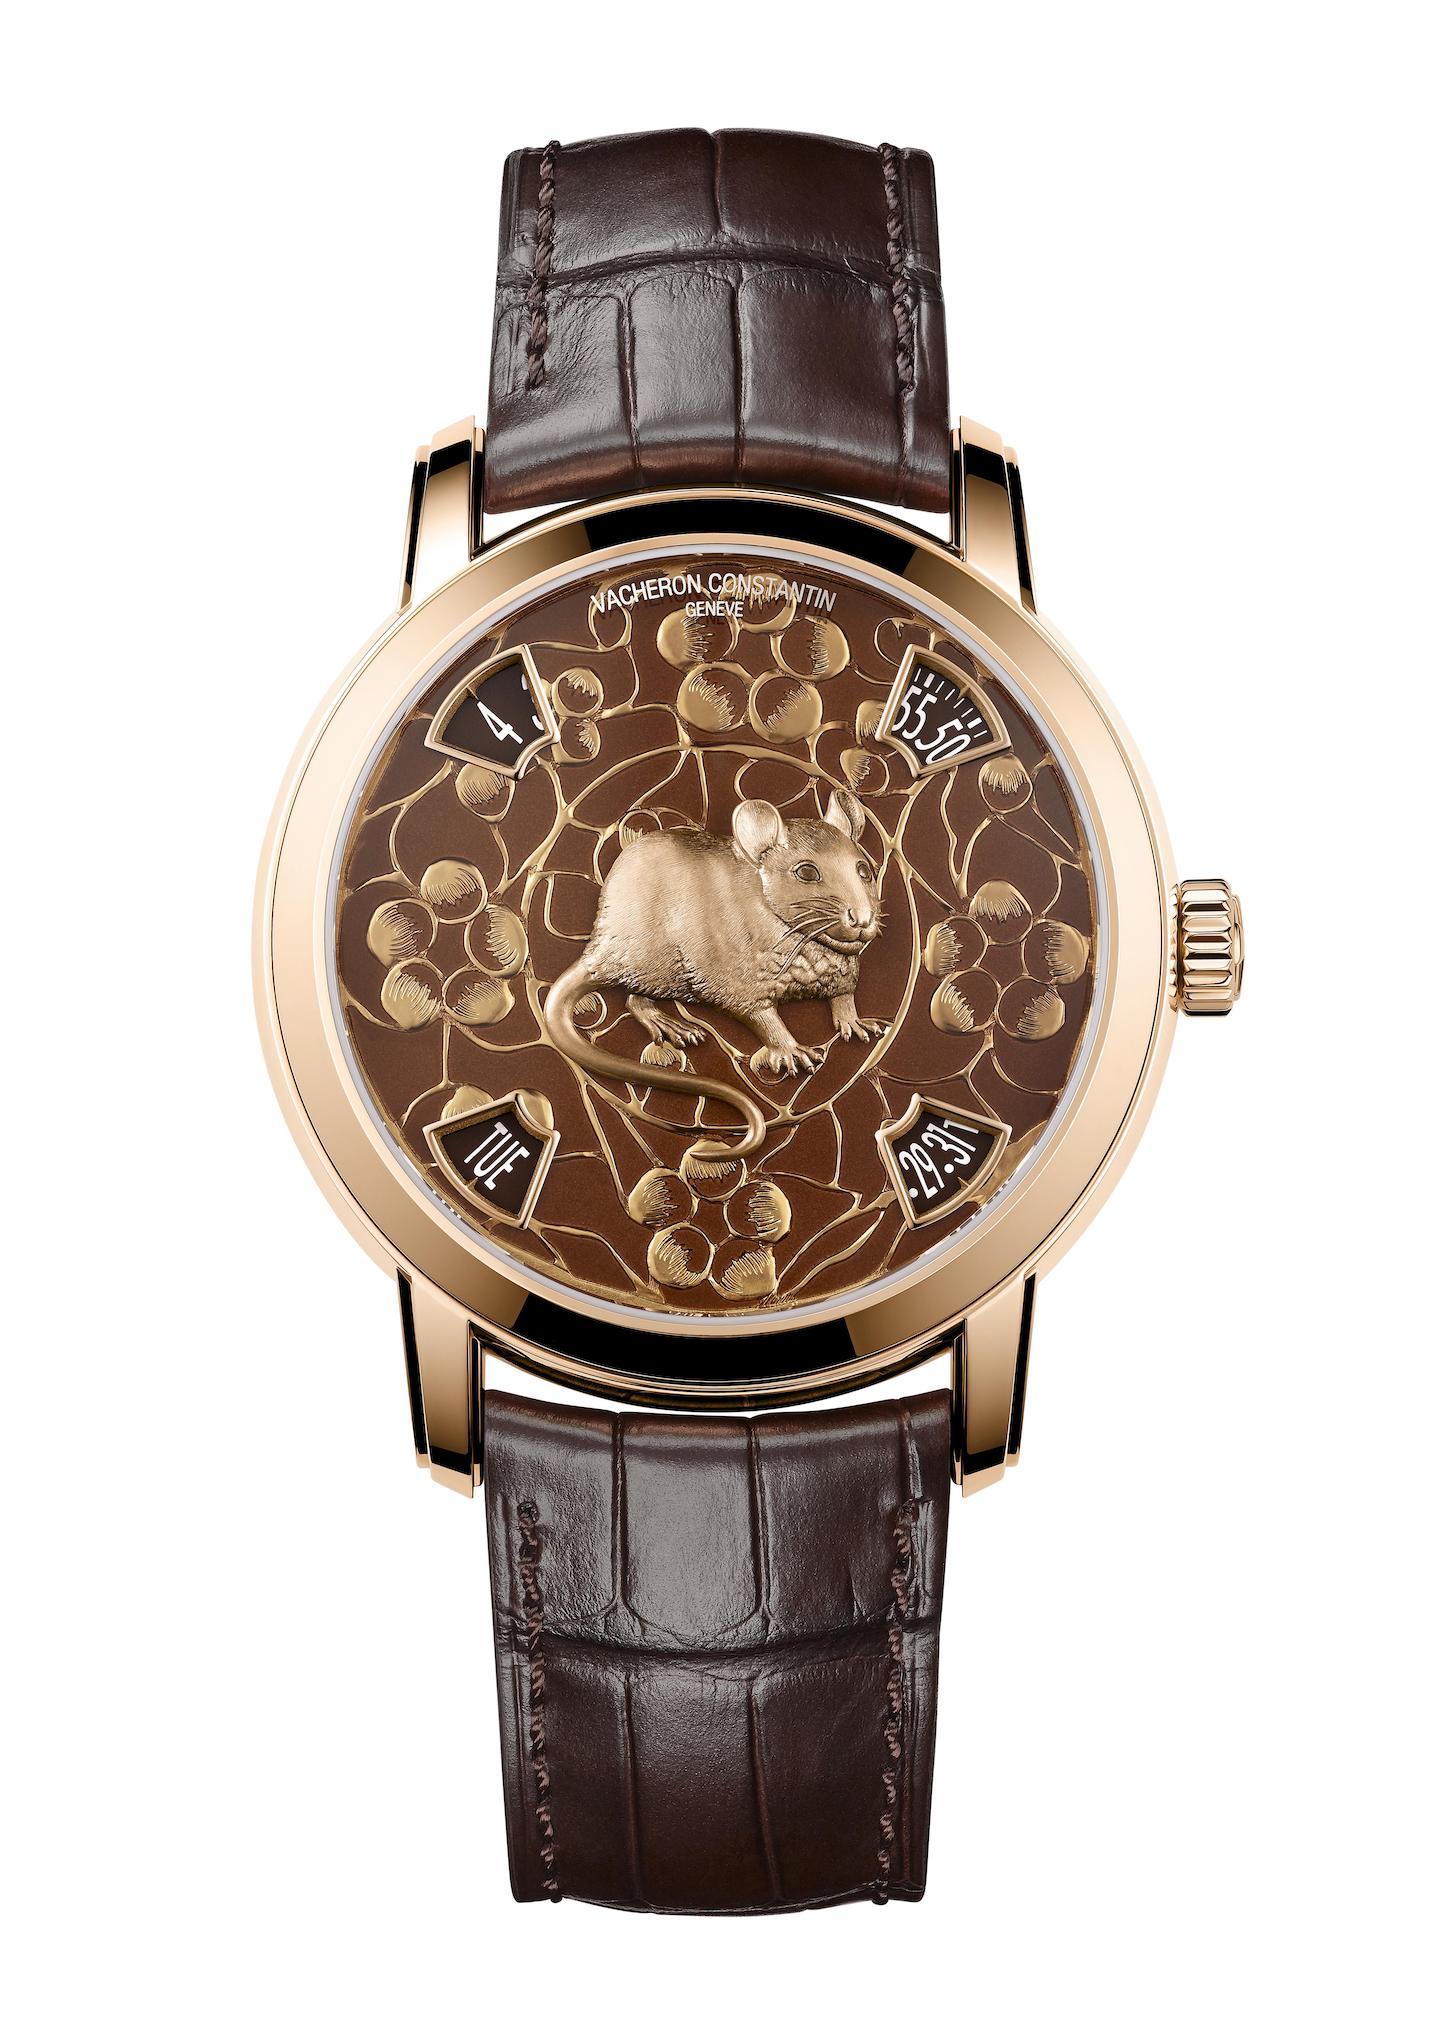 Vacheron Constantin Zodiac Chinese Year of the Rat 2020 Metiers d'Art watch.